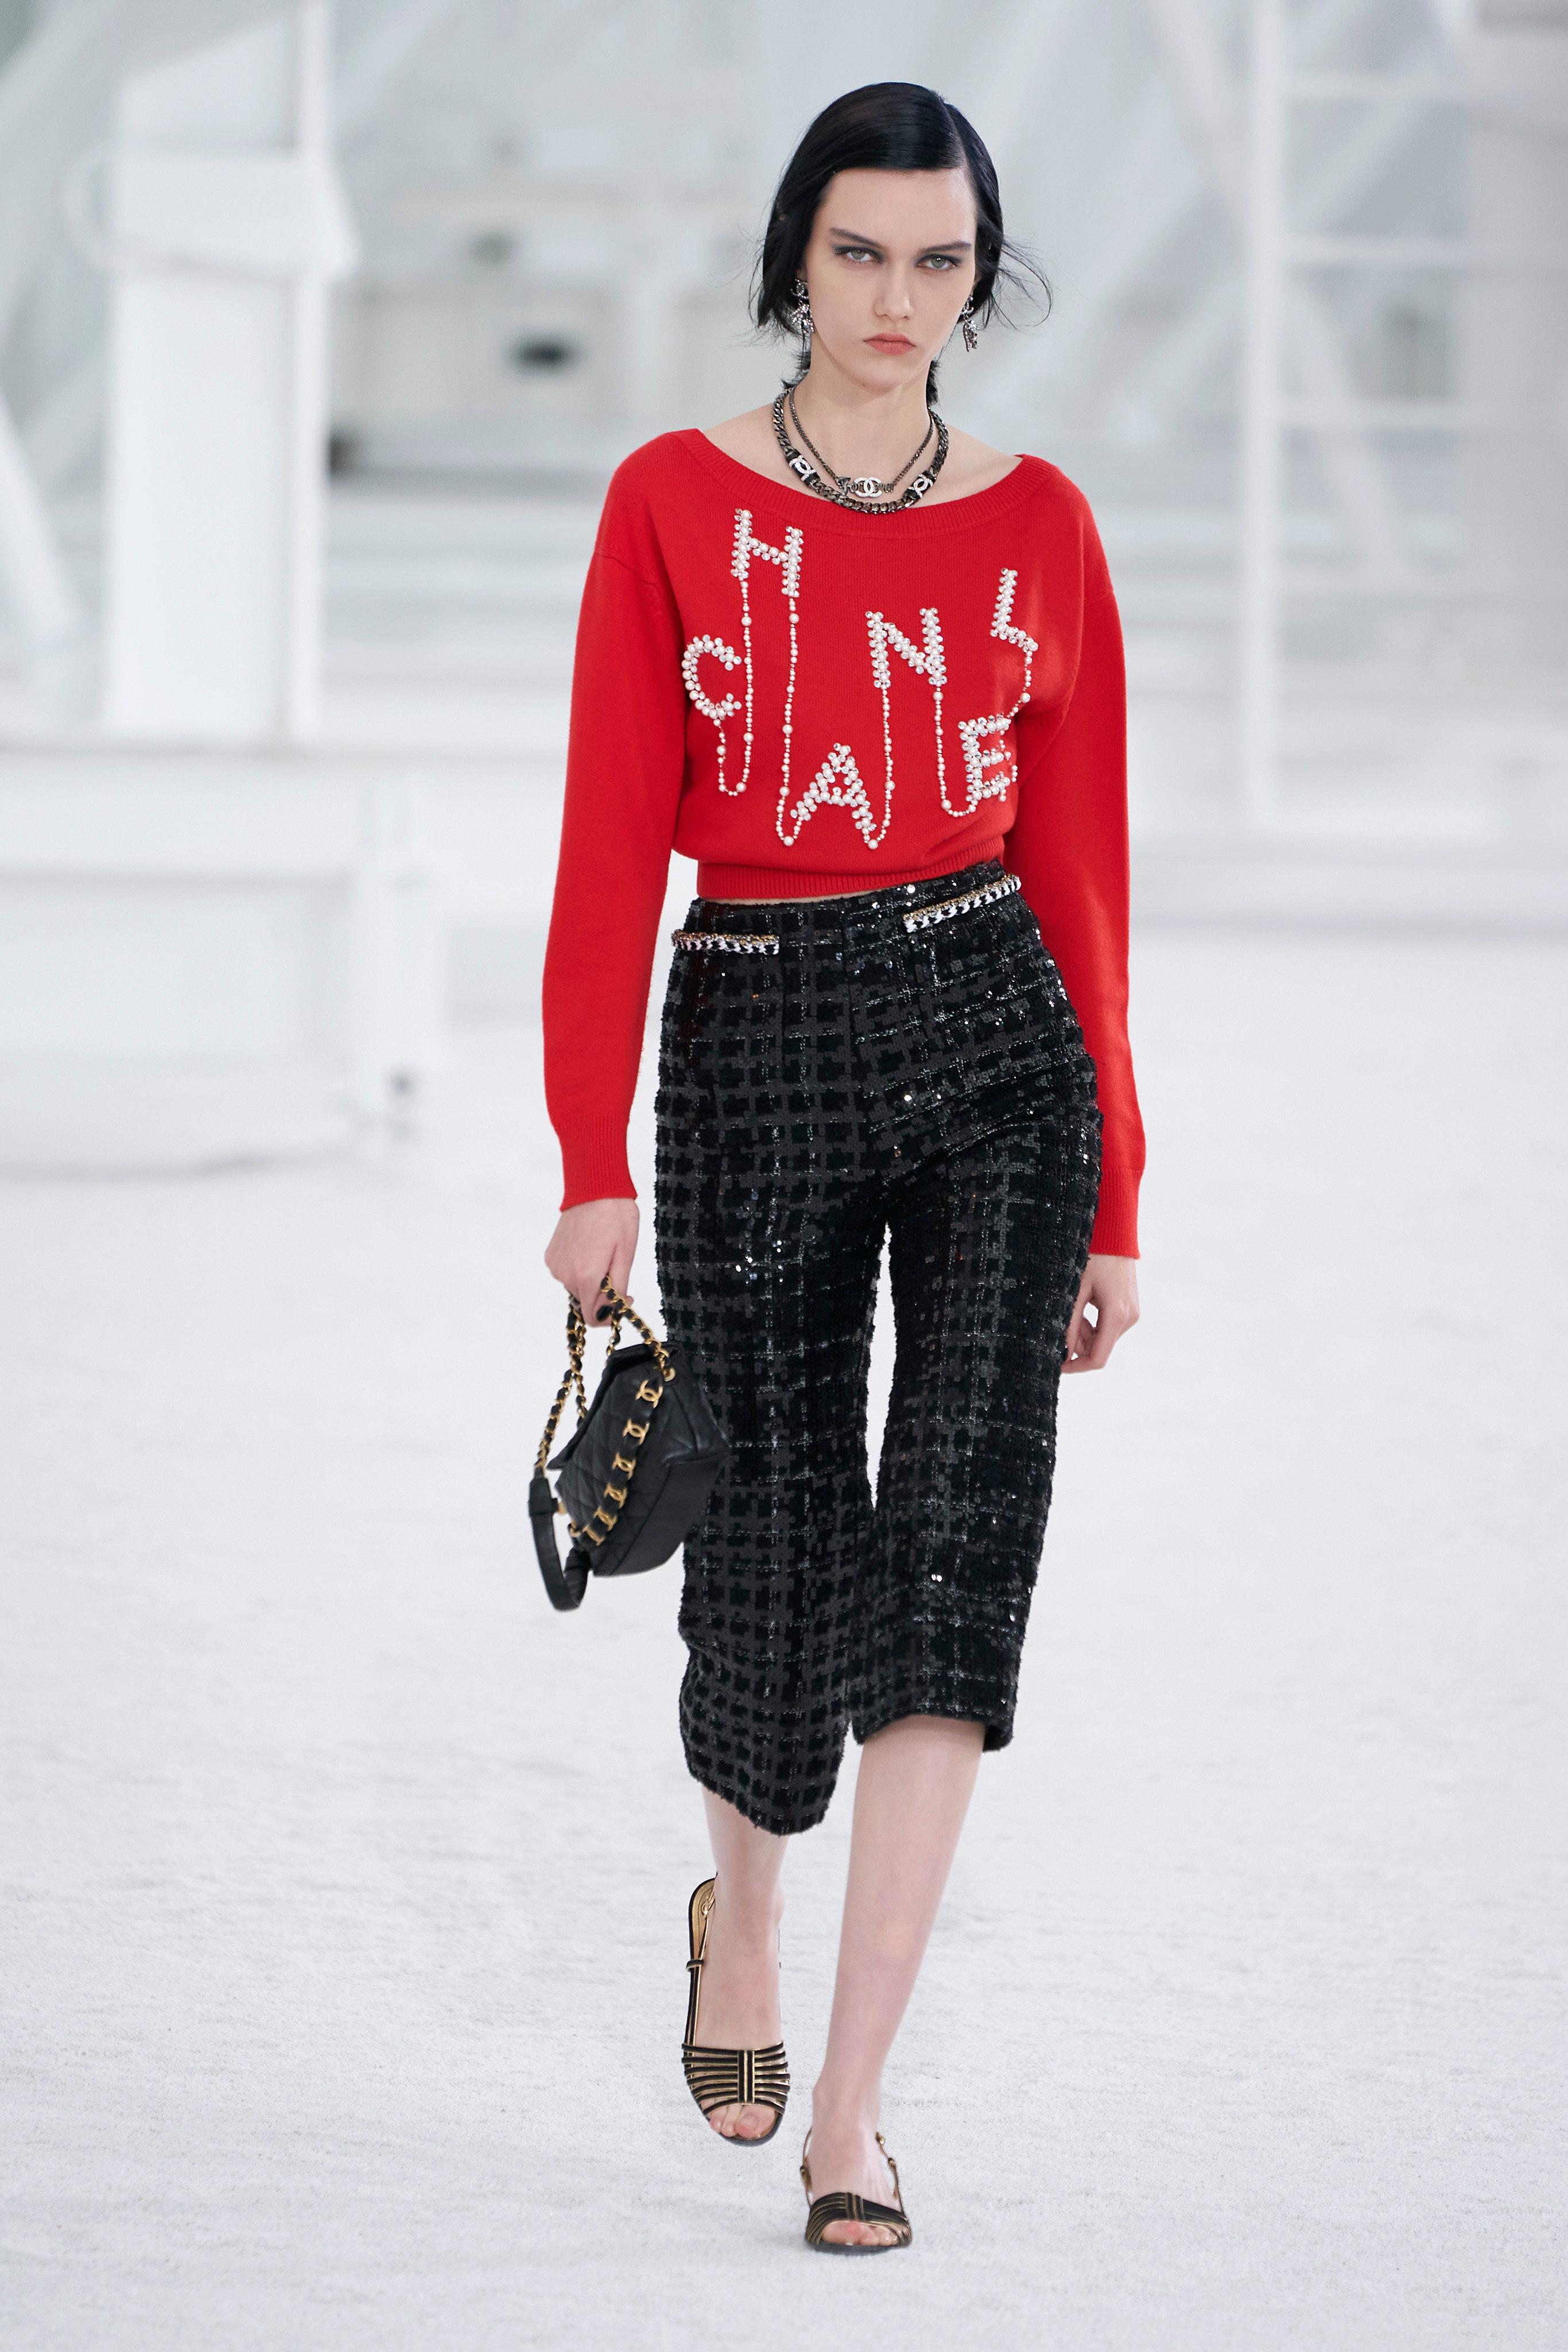 Chanel Spring-Summer 2021